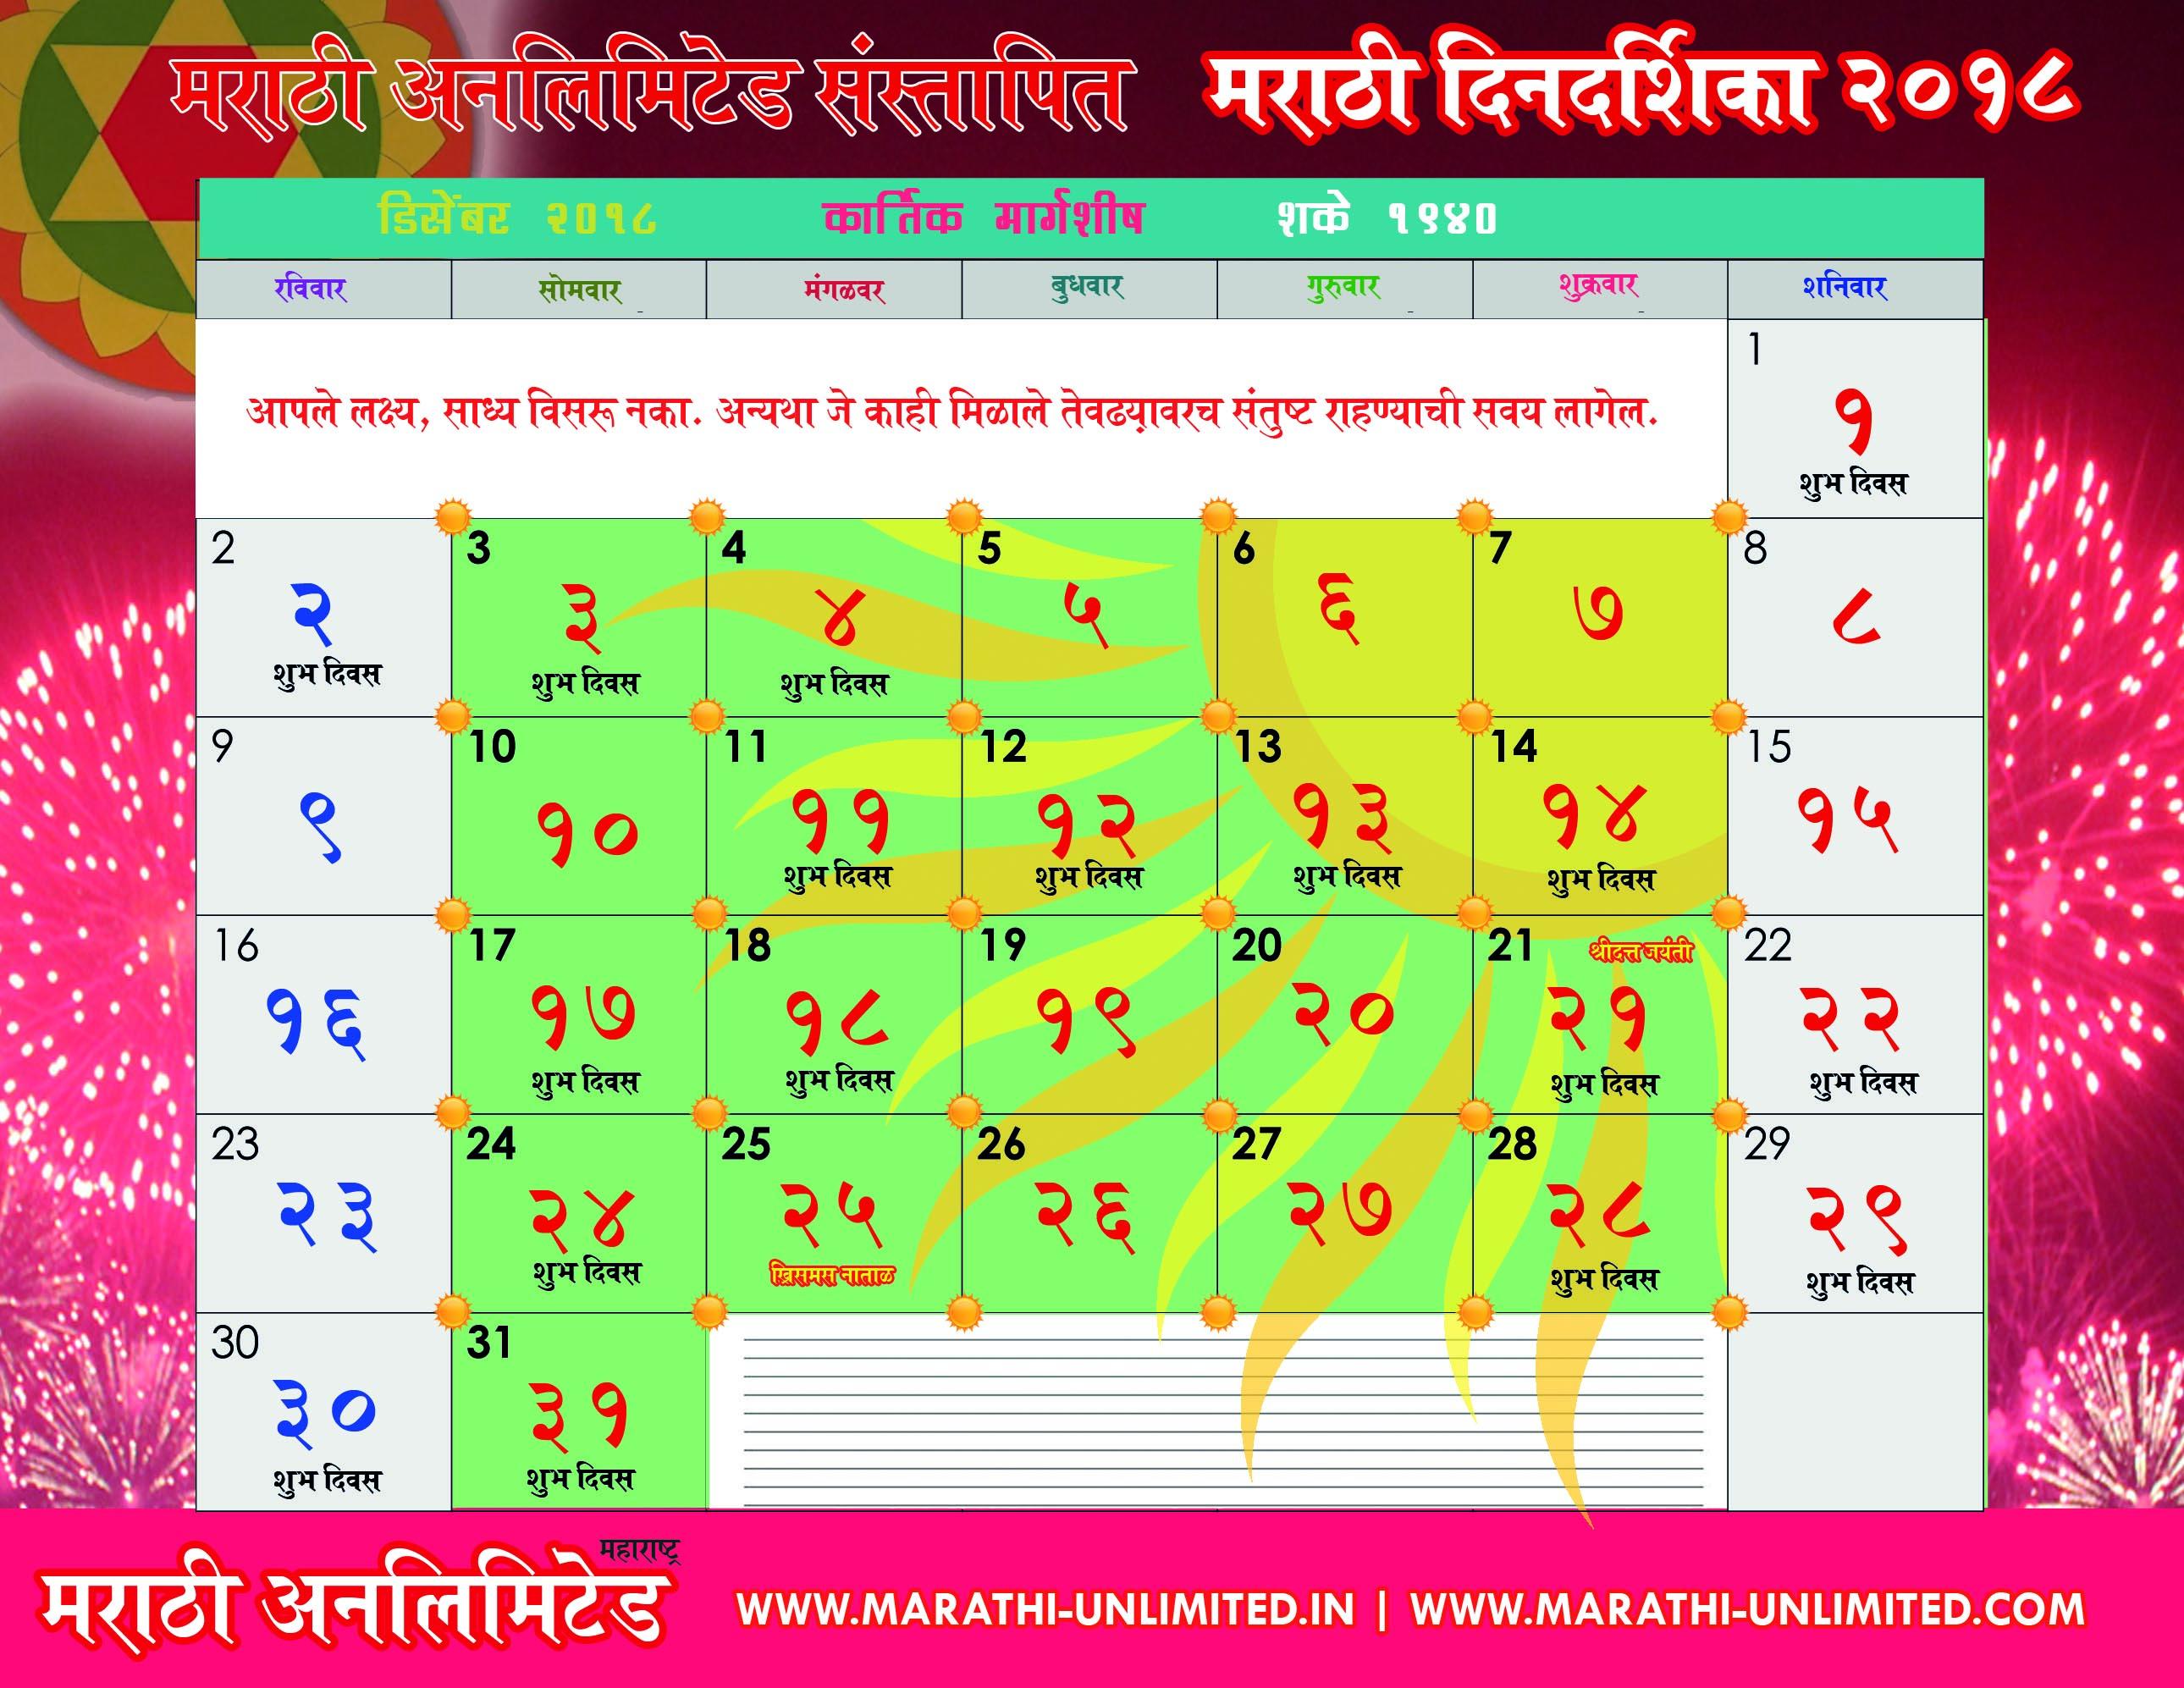 December 2018 Marathi Monthly Calendar